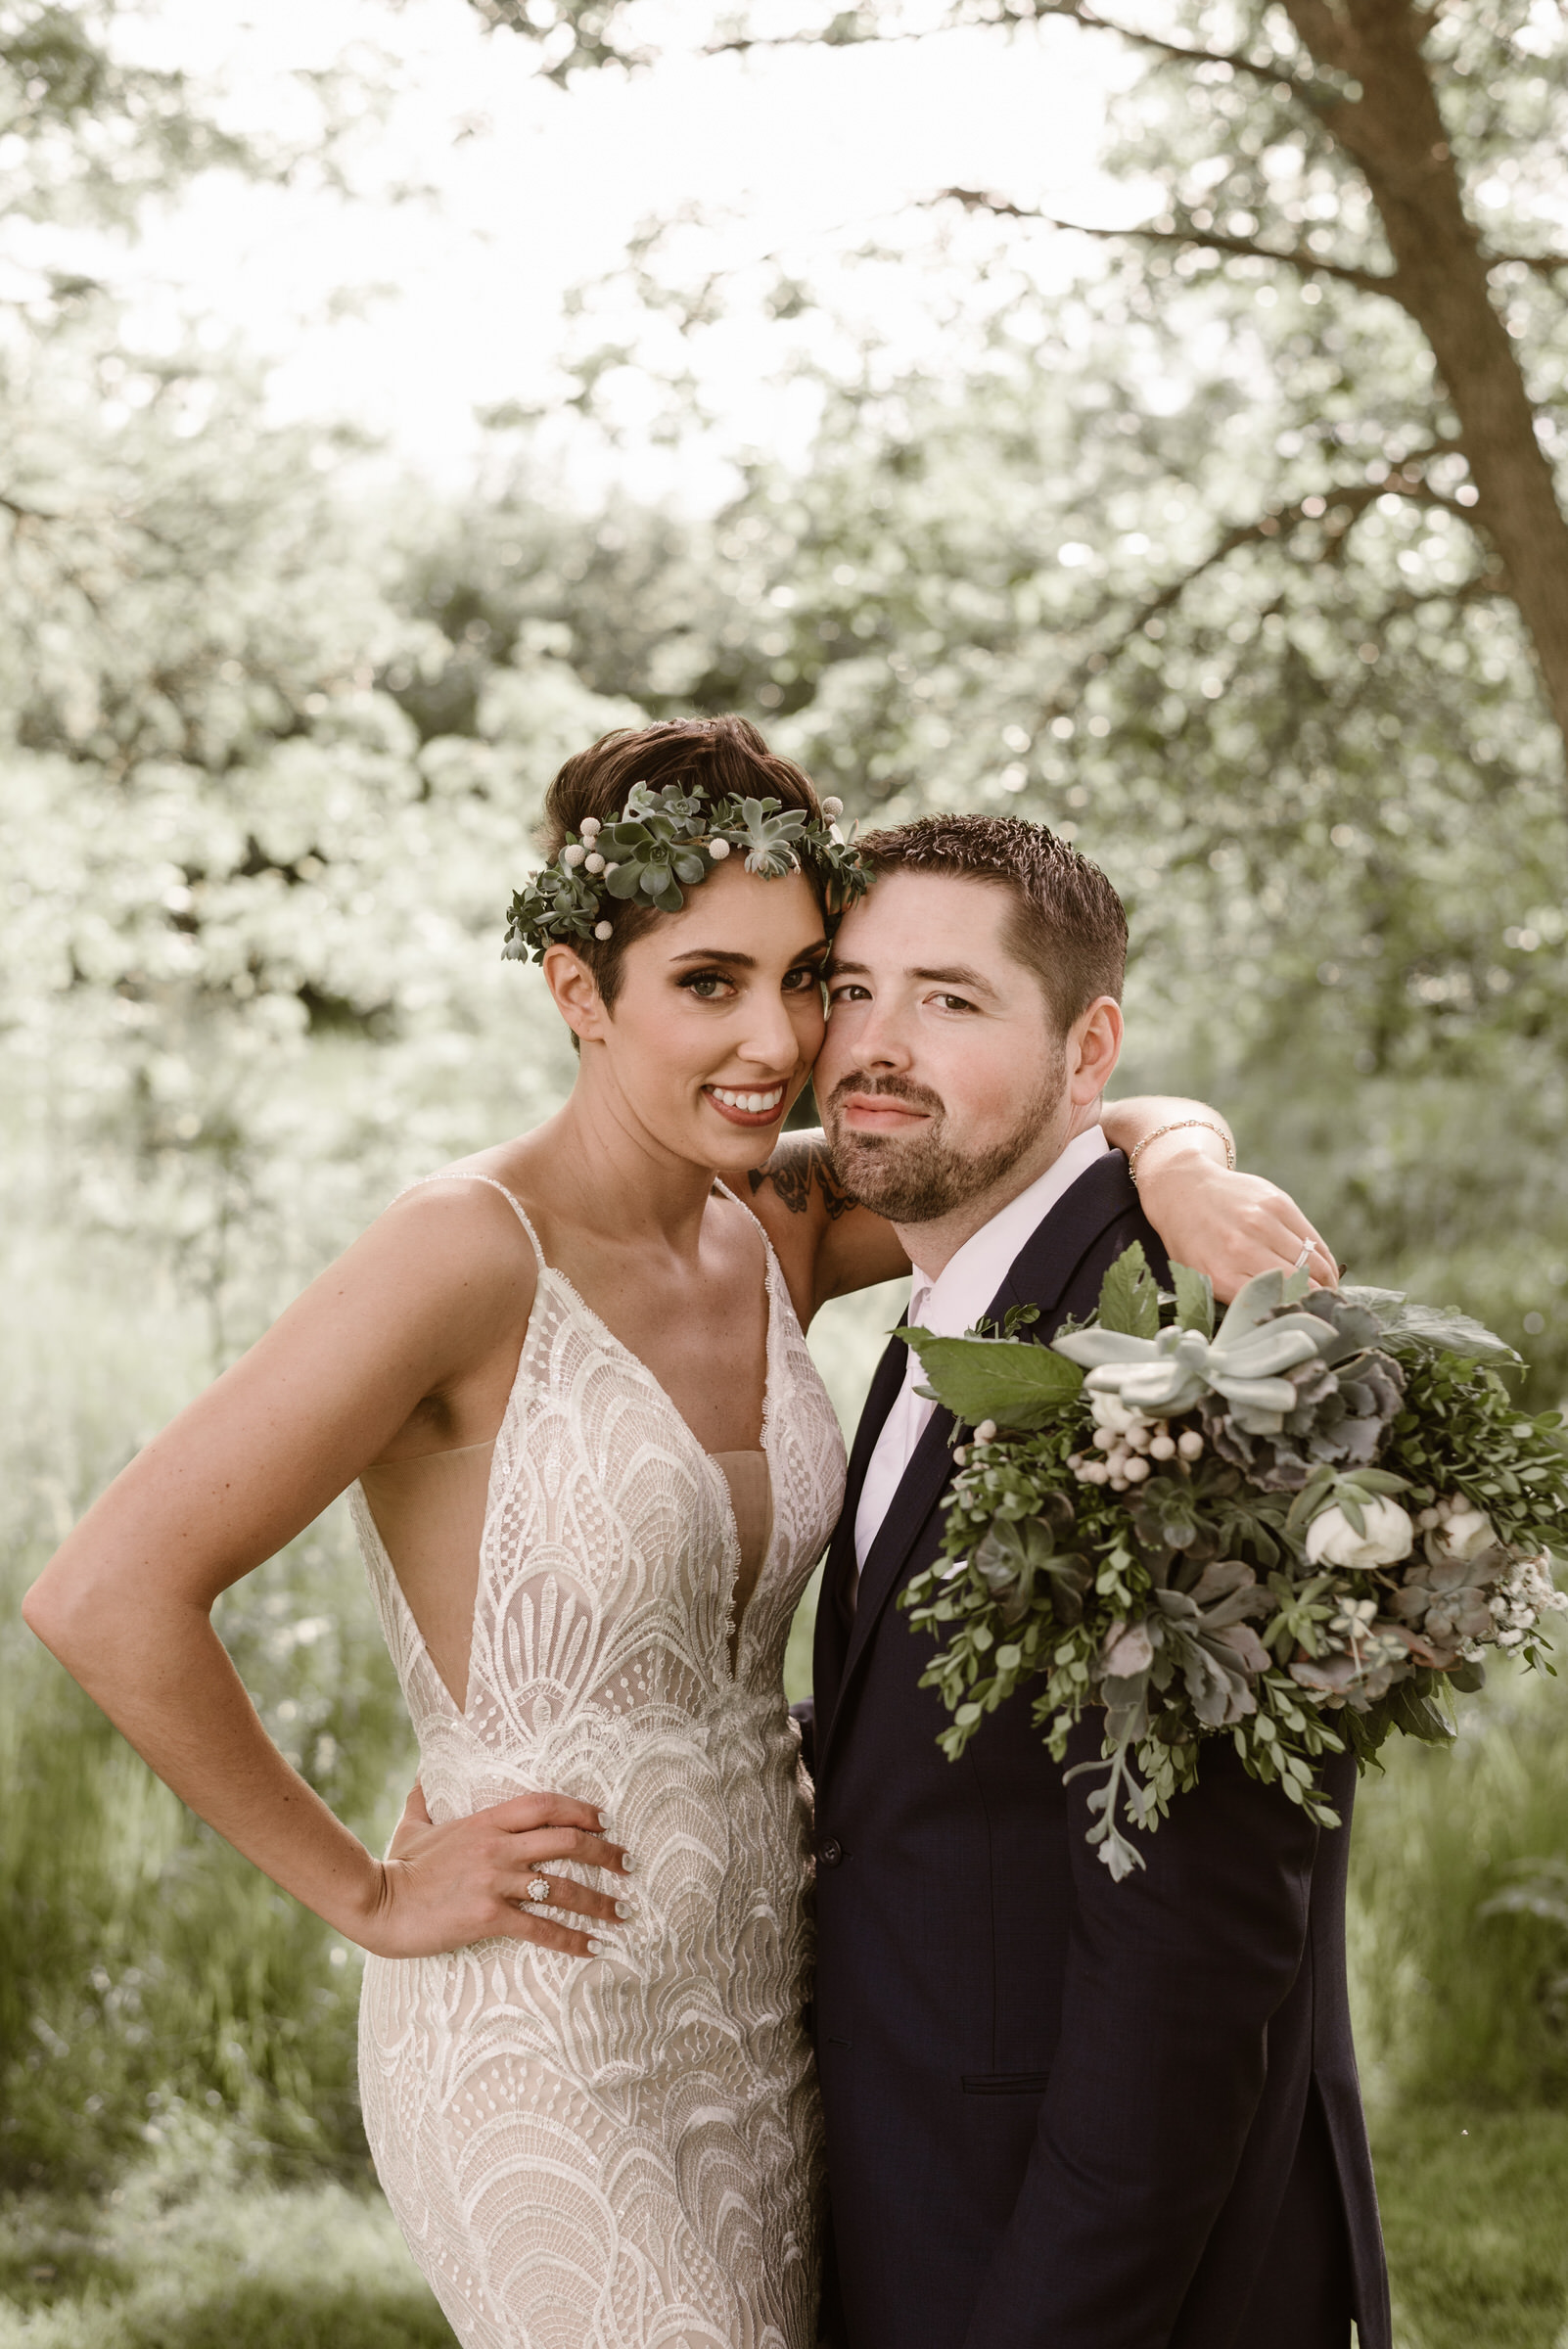 Wilderness-Ridge-Lincoln-Nebraska-Wedding-Kaylie-Sirek-Photography-071.jpg